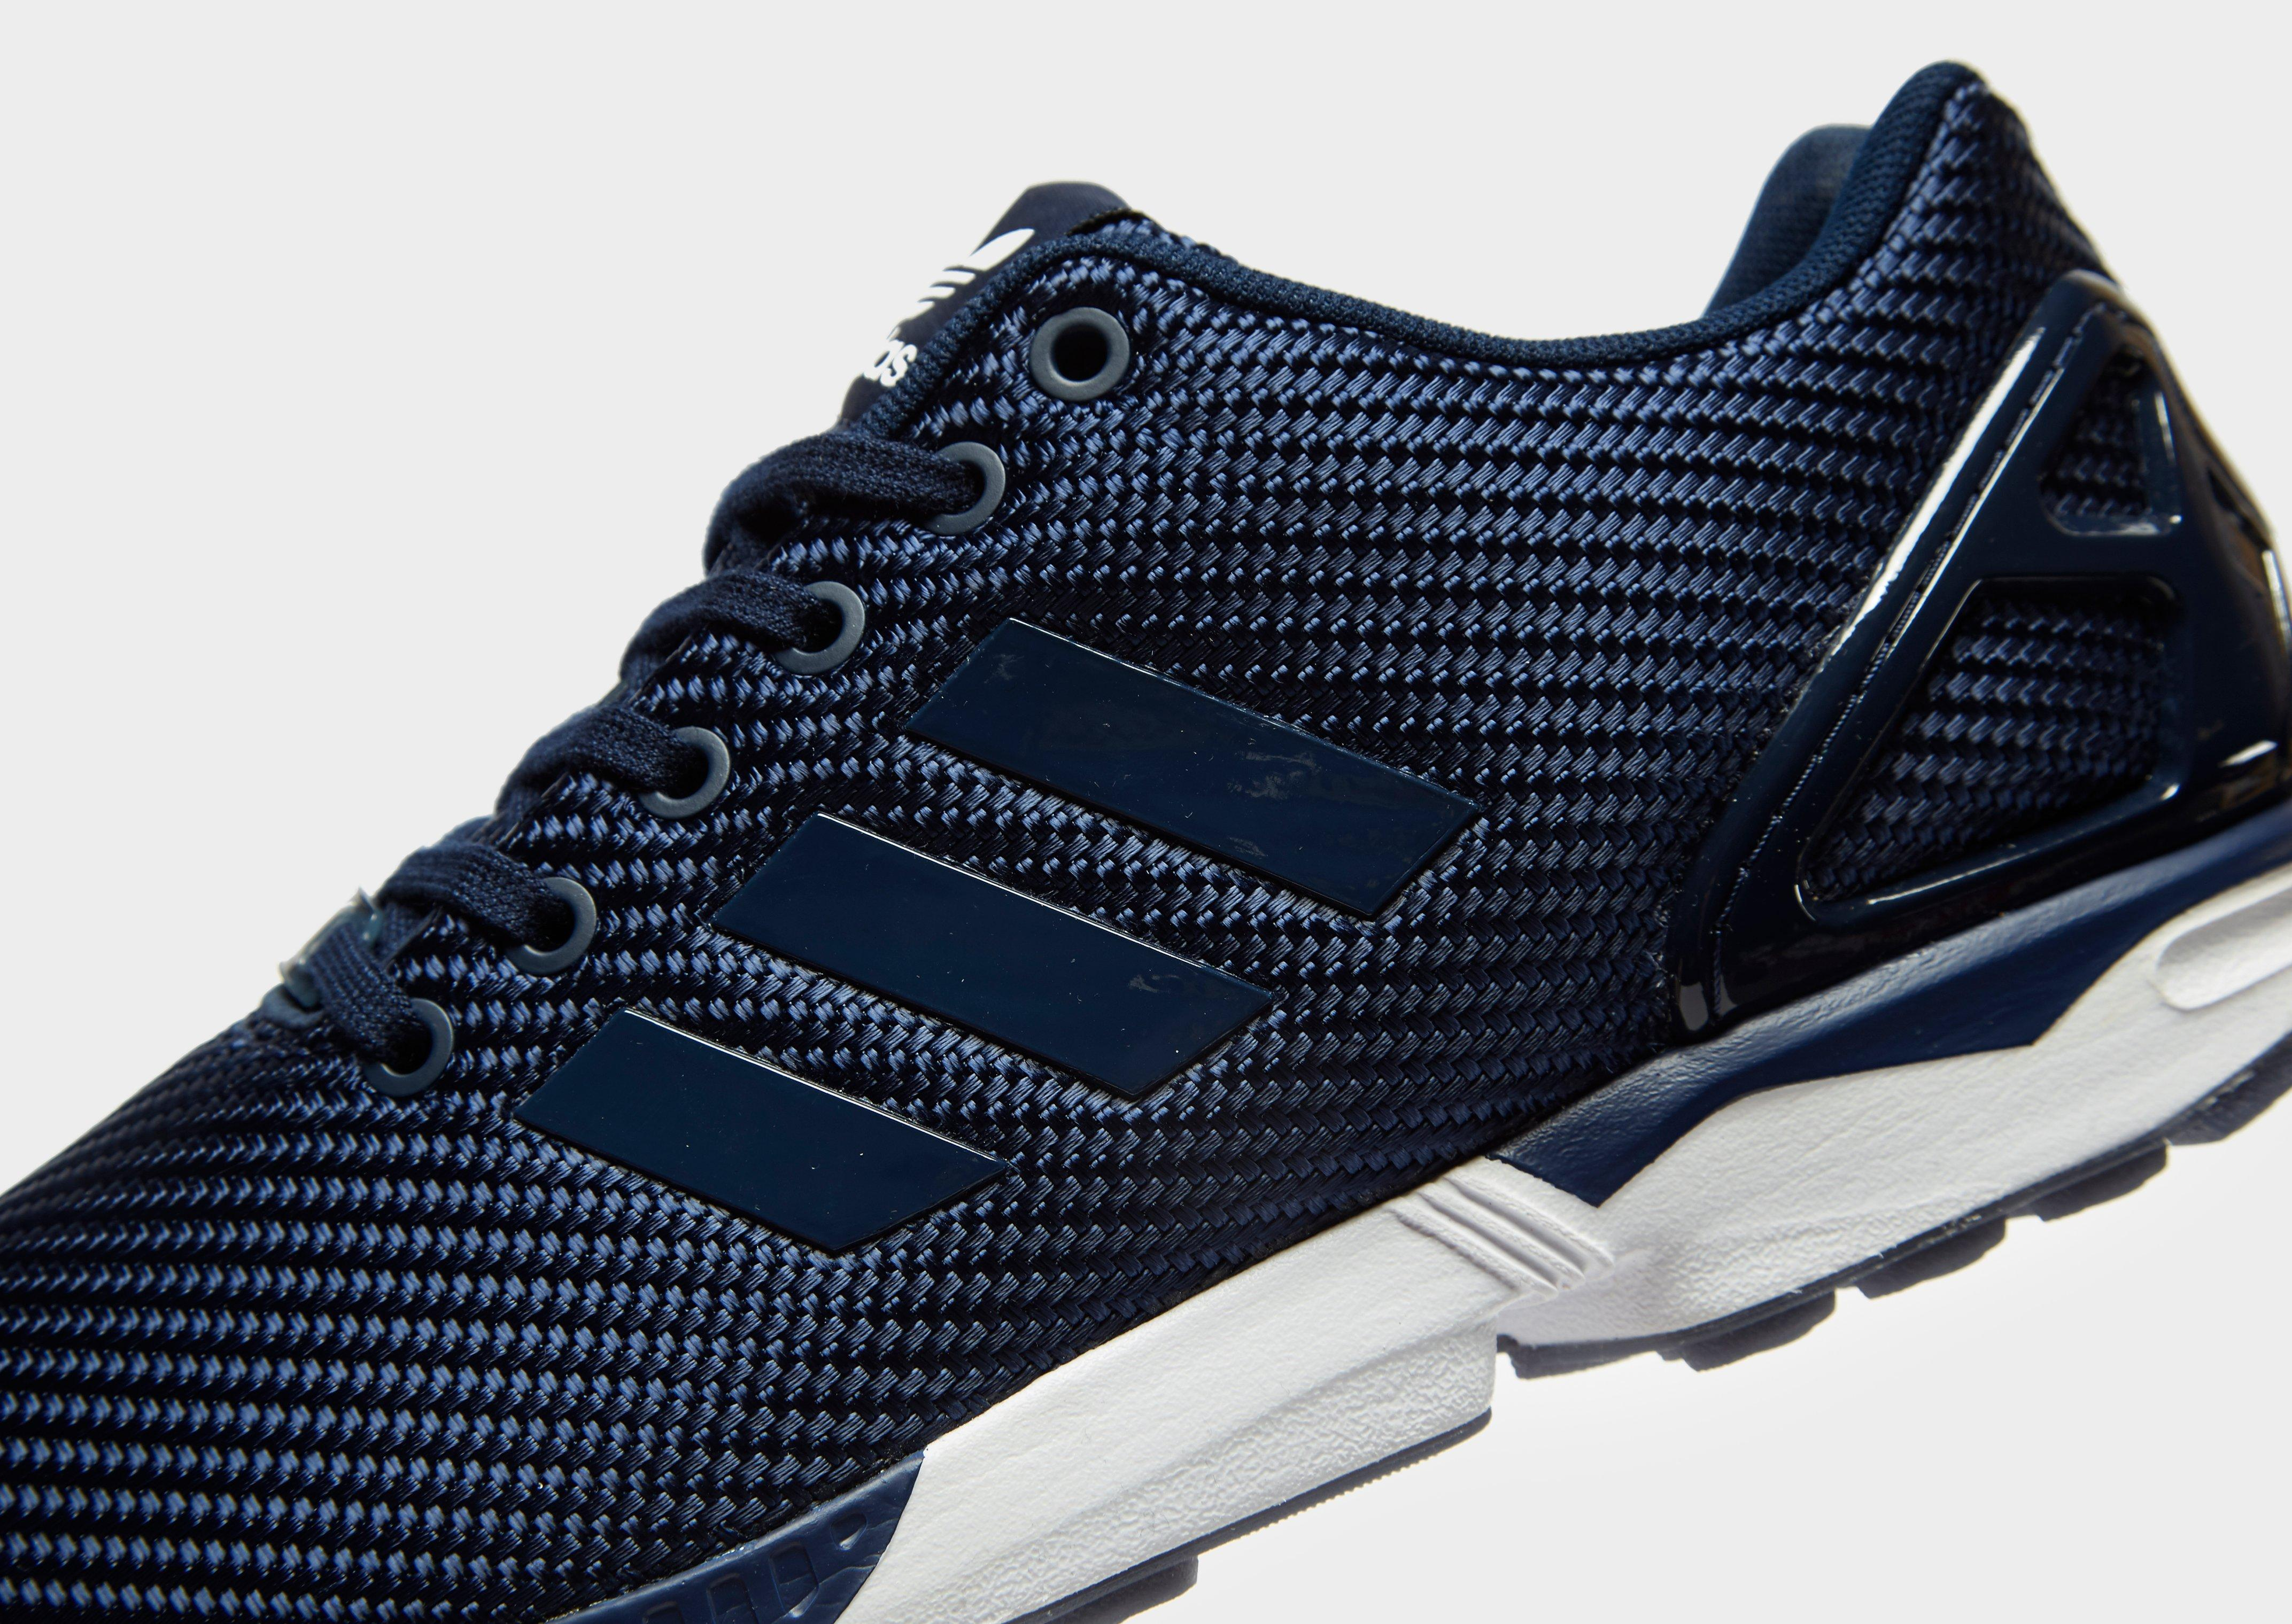 Adidas Shoes 3 Stripes wallbank lfc.co.uk